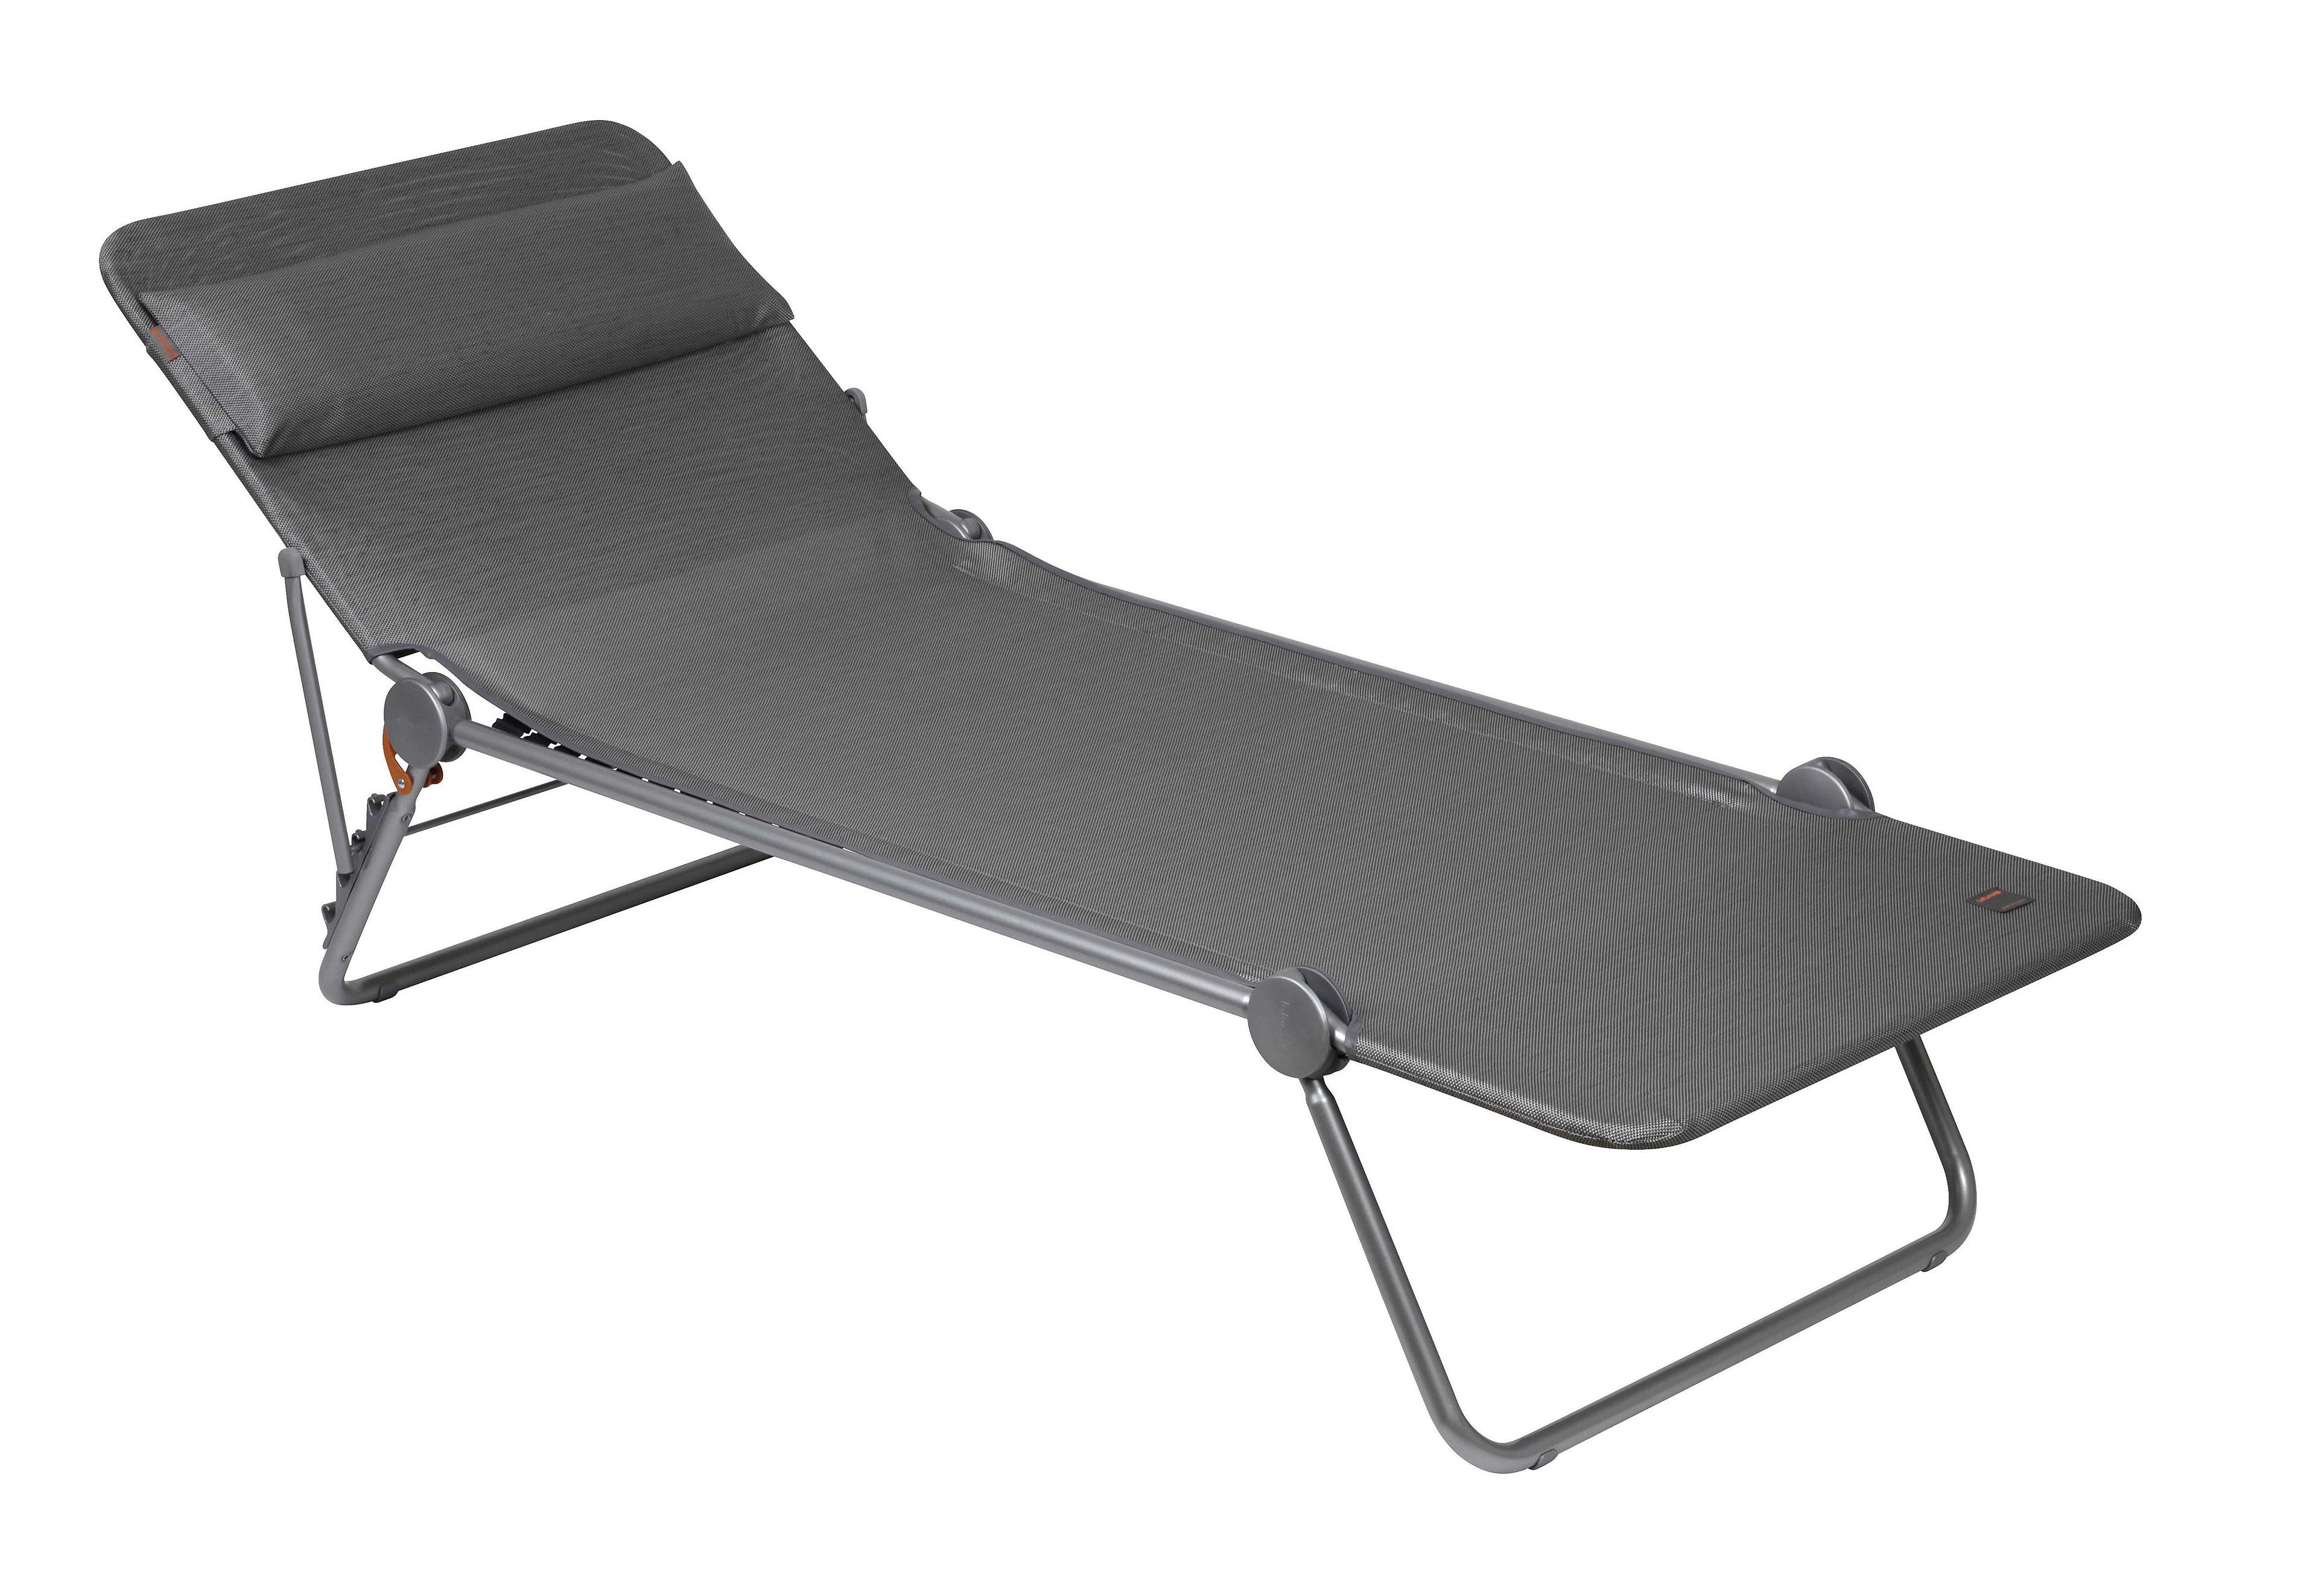 bain de soleil sunside plus lafuma carbone tissage 2. Black Bedroom Furniture Sets. Home Design Ideas